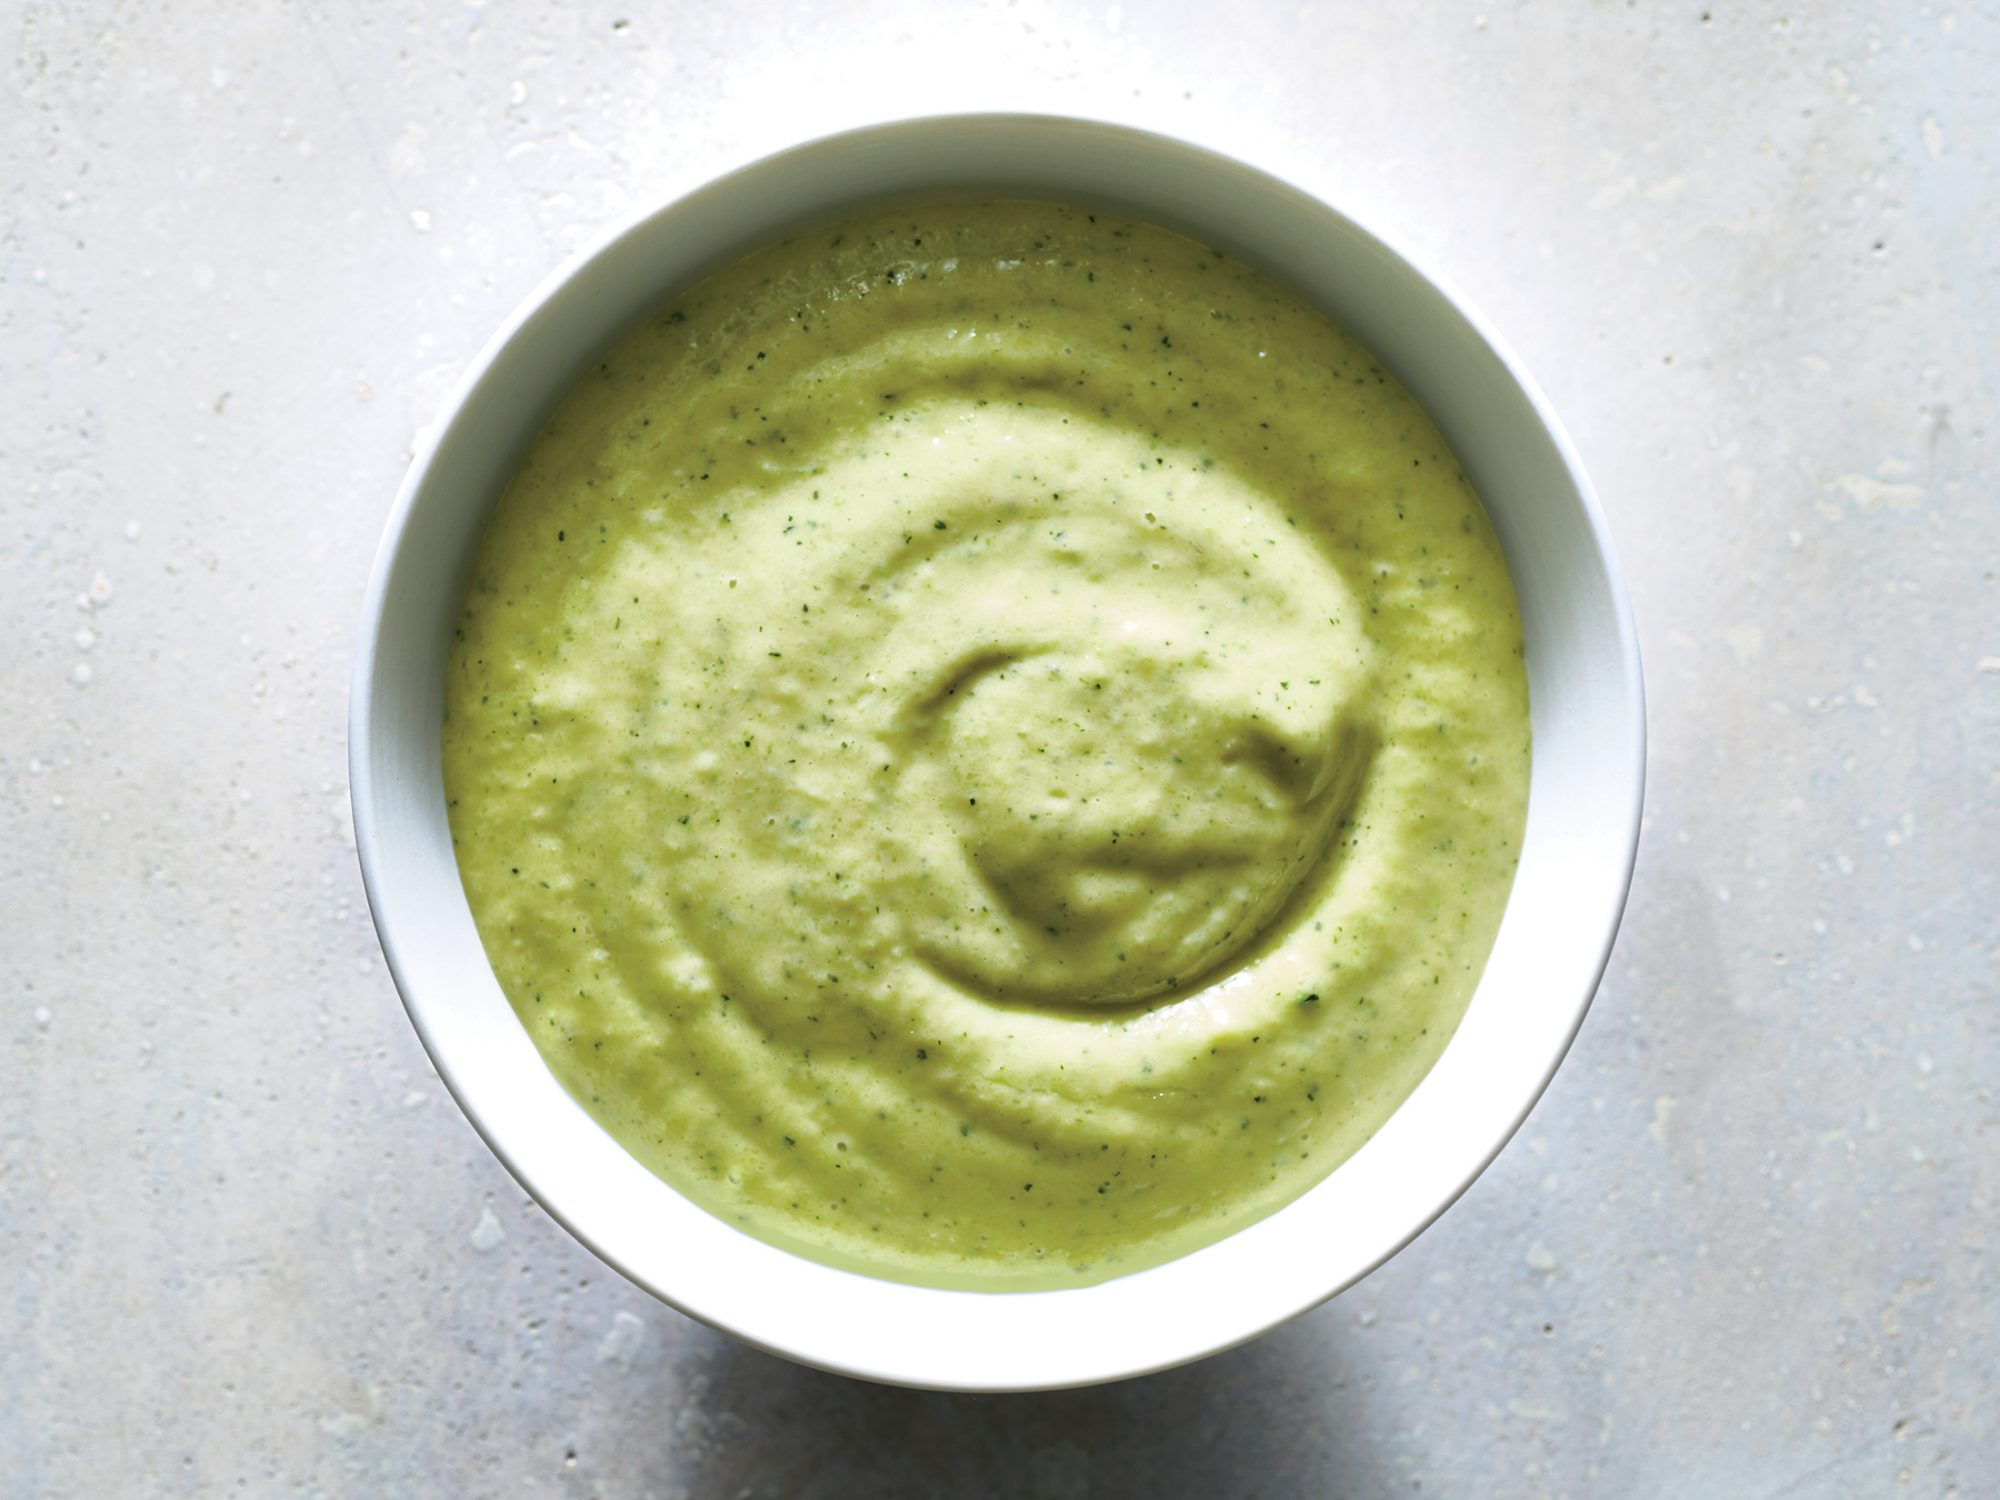 Creamy Zucchini-Lime Dressing